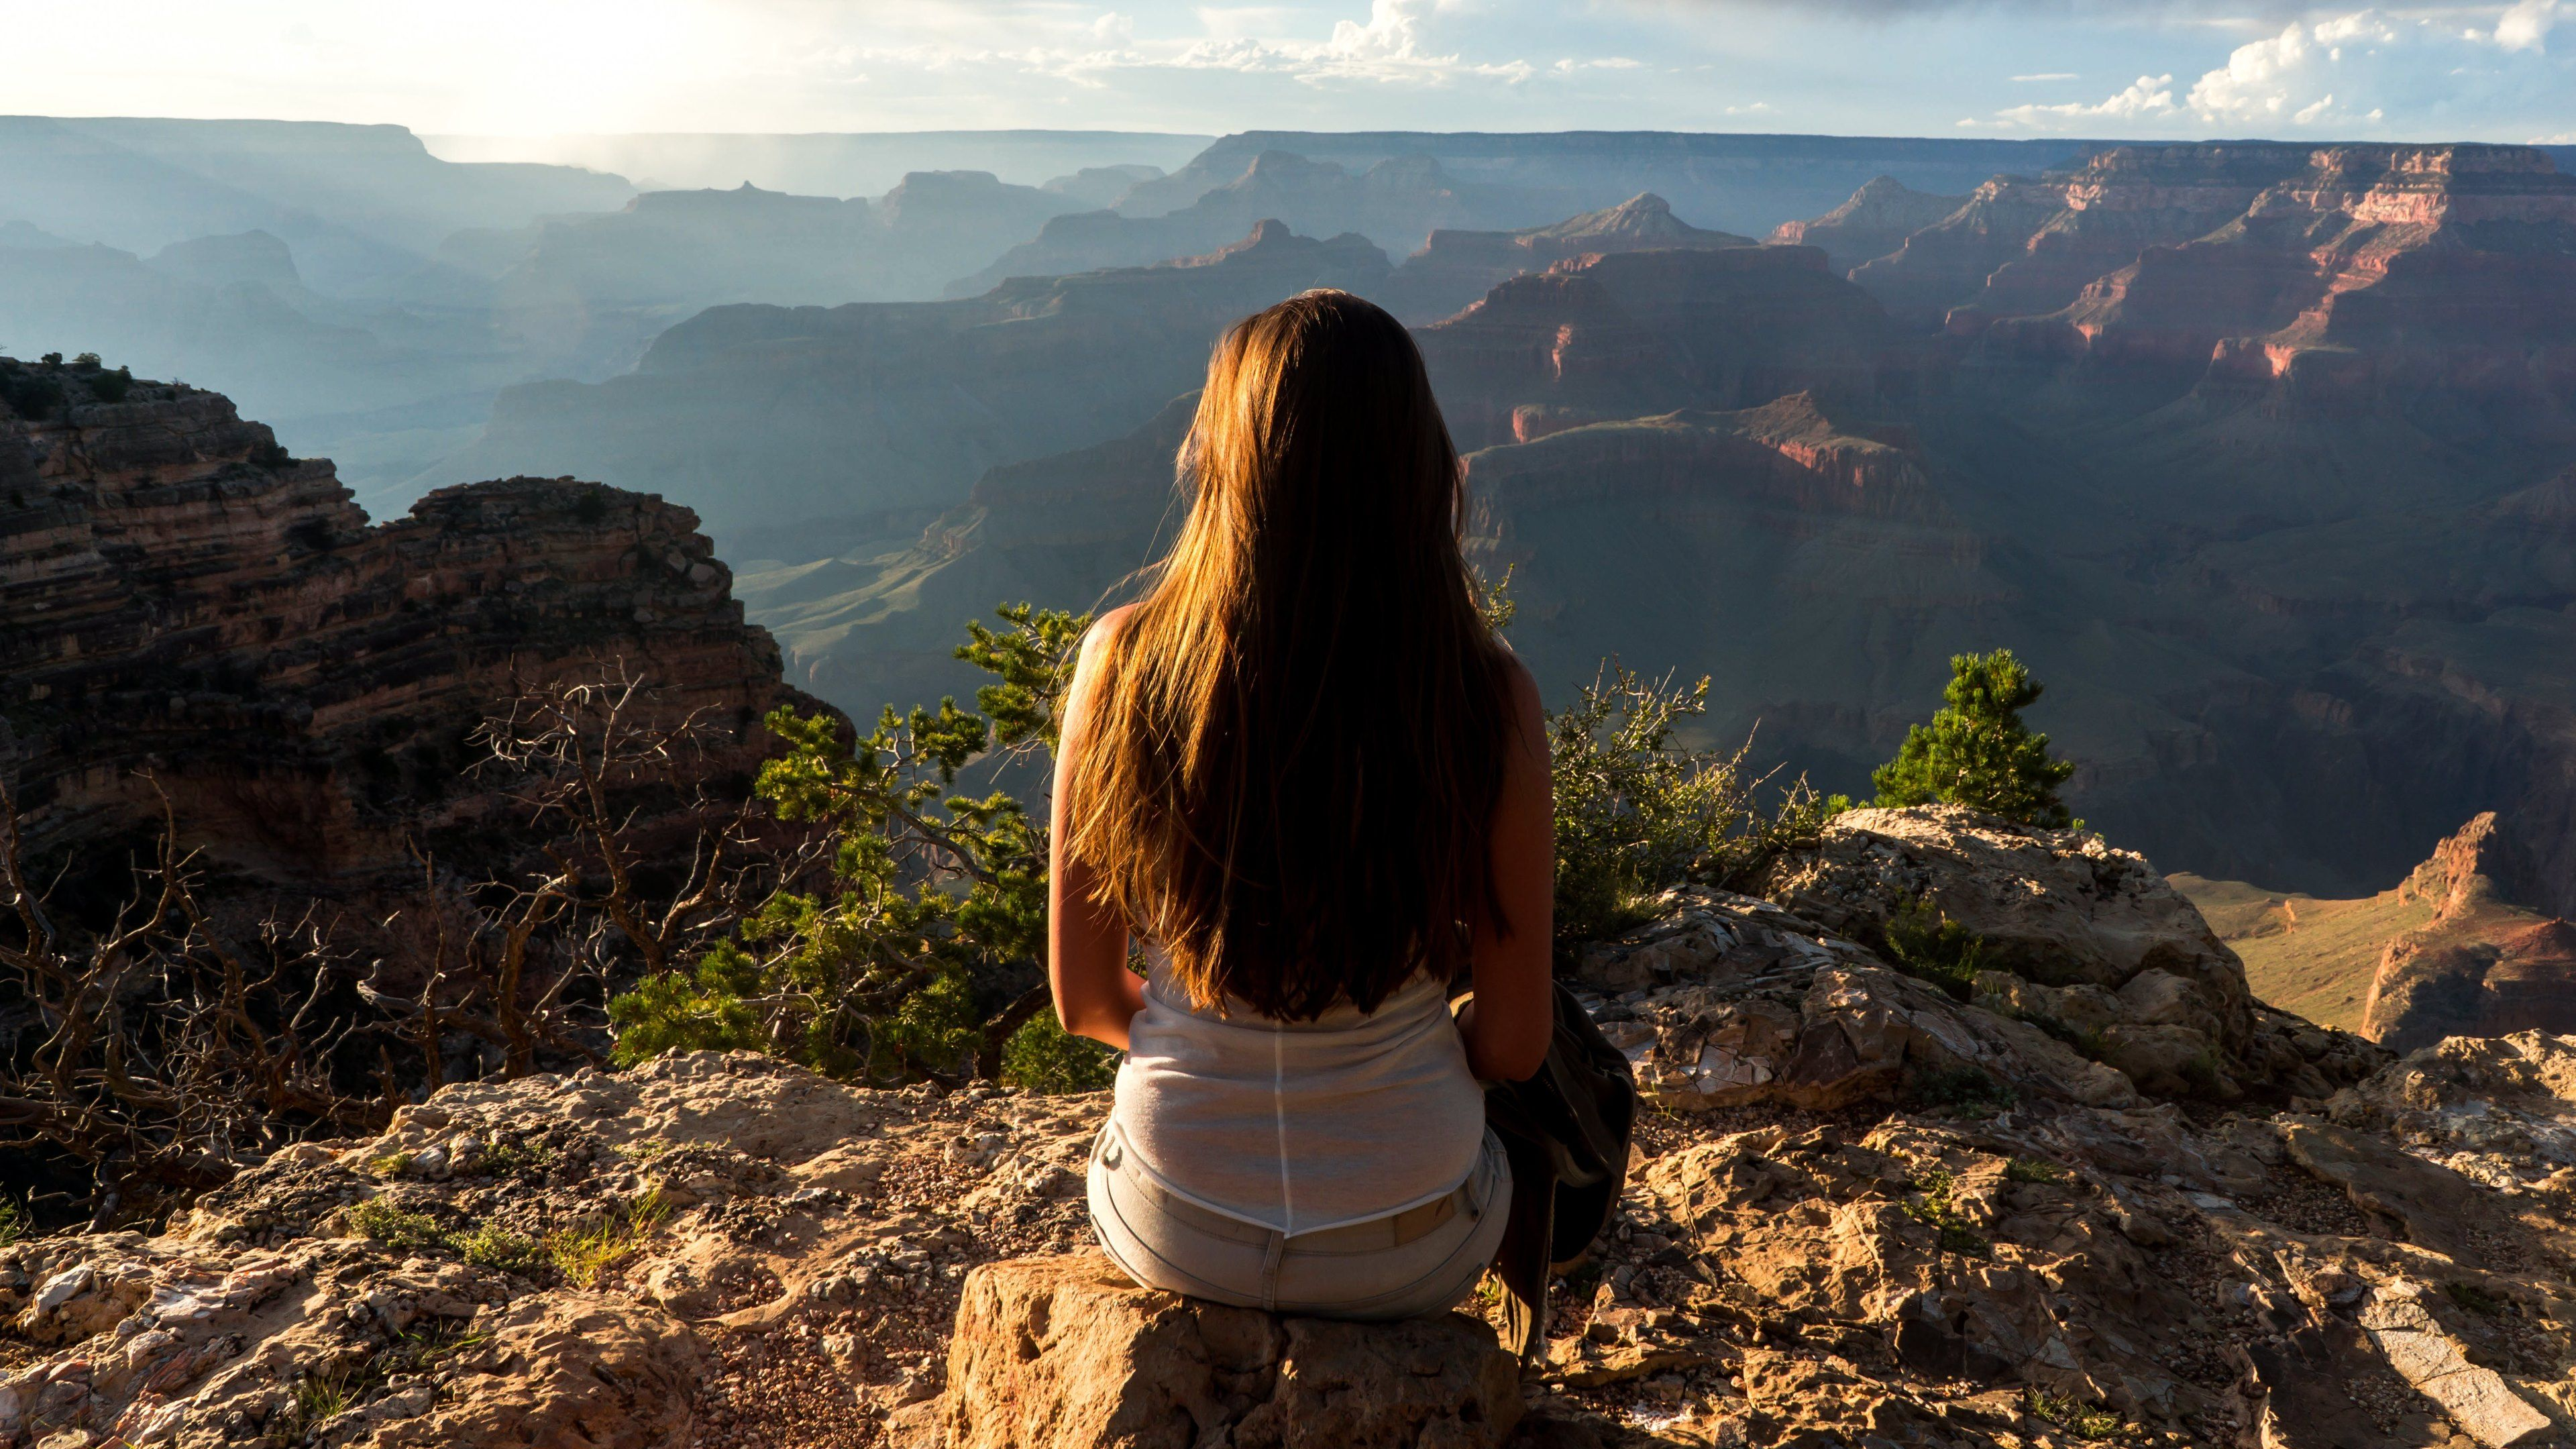 Mountain Woman Wallpapers Top Free Mountain Woman